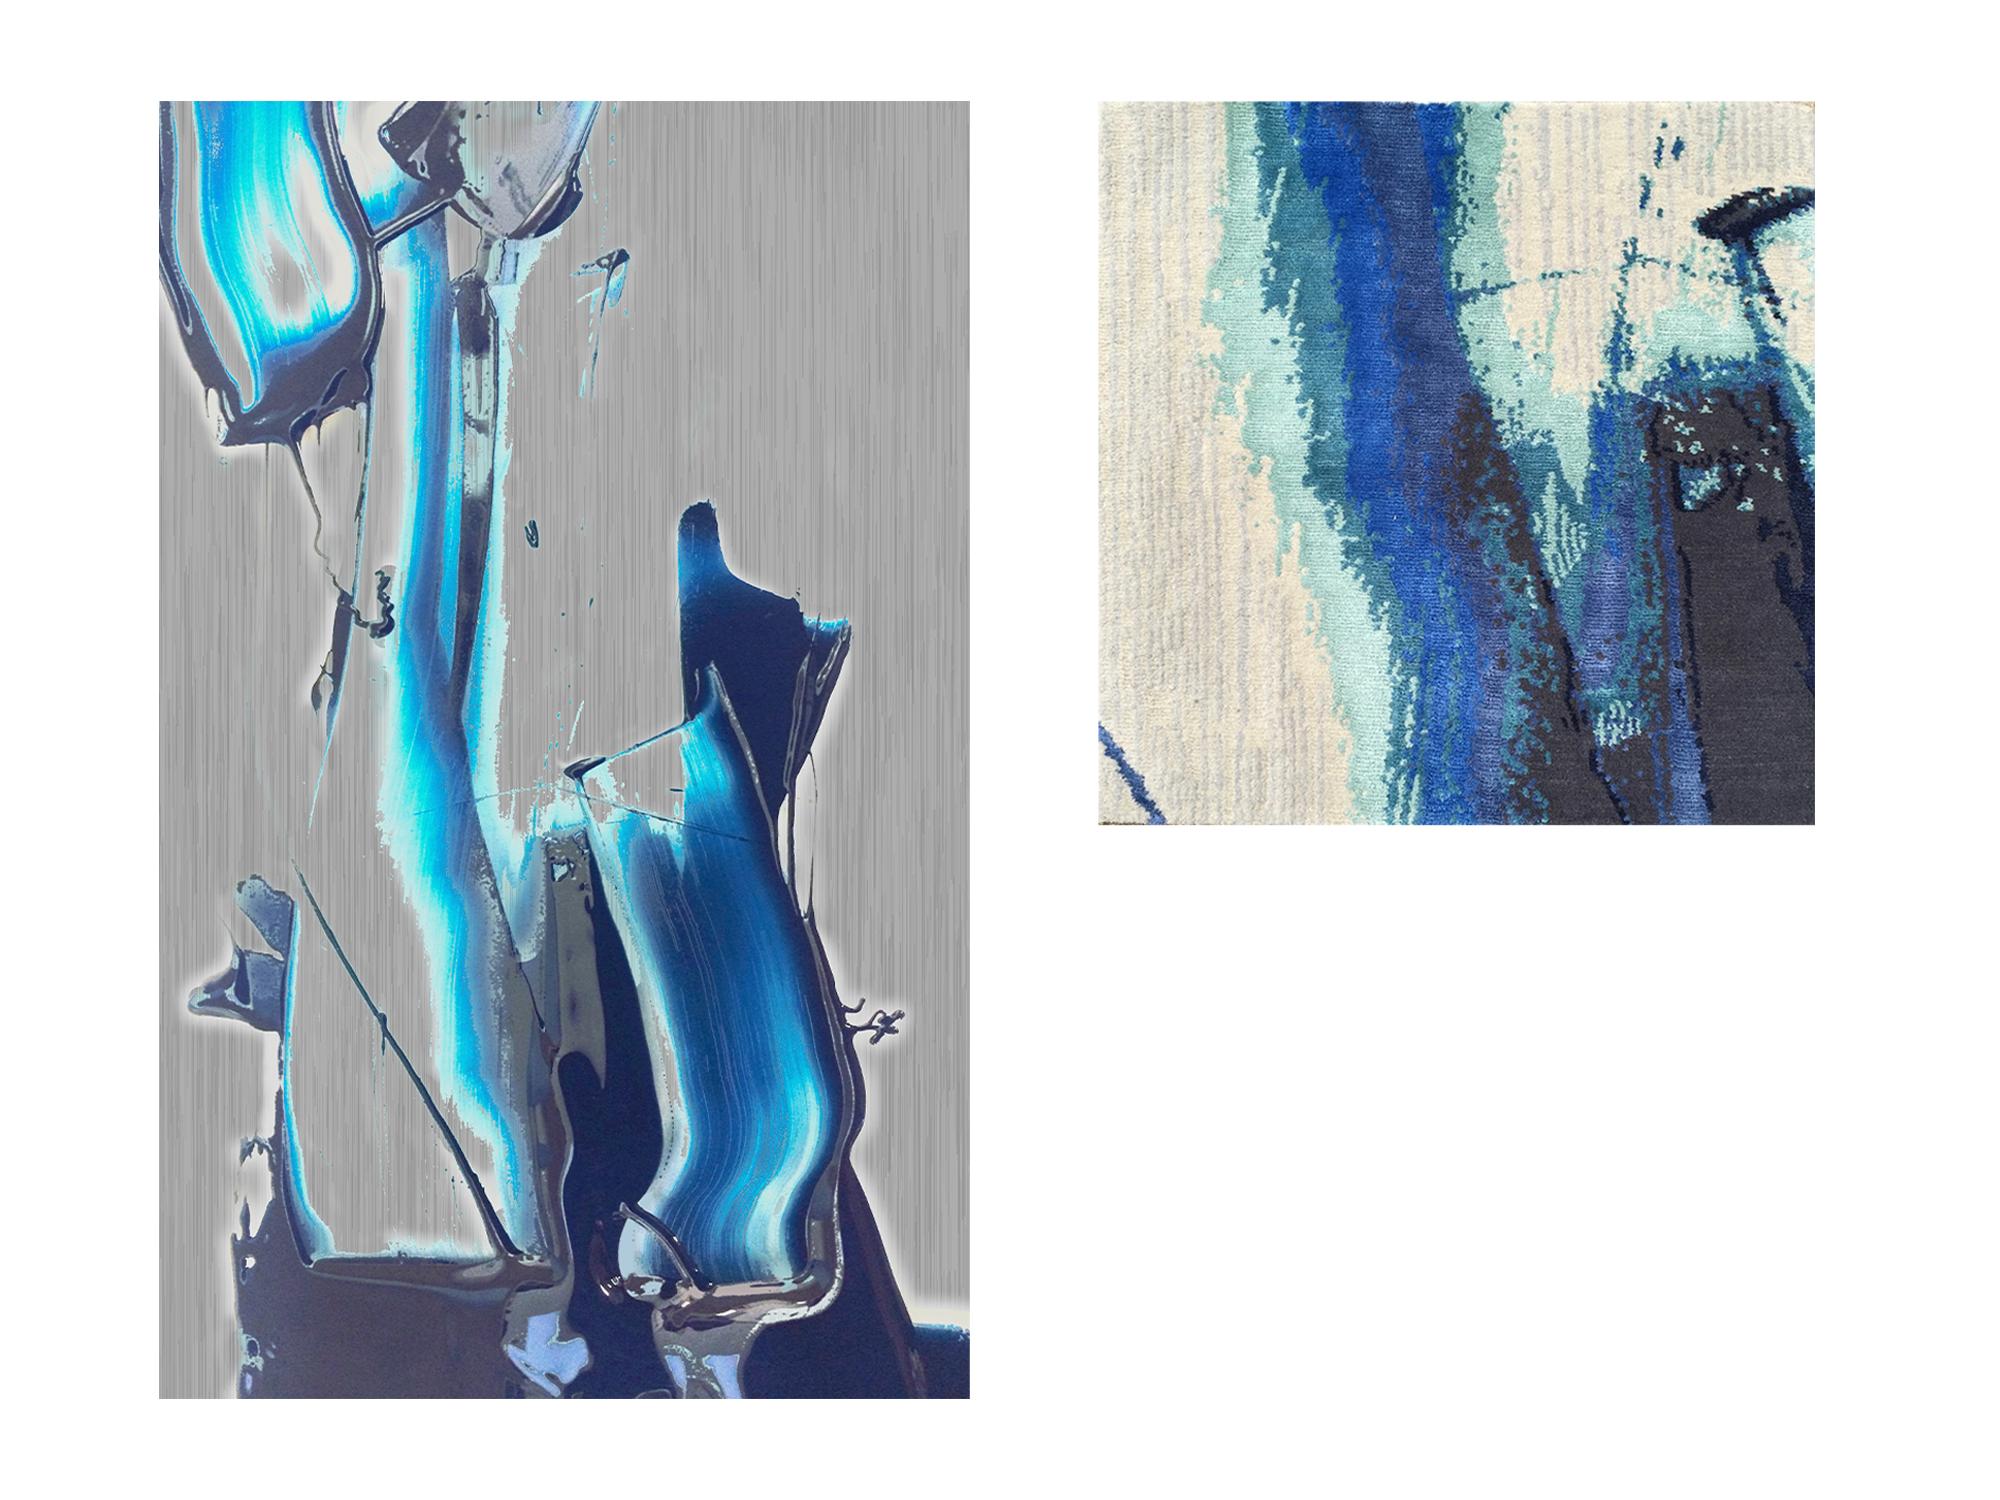 Ink Flow  NP001 Artist: Nicola Parente